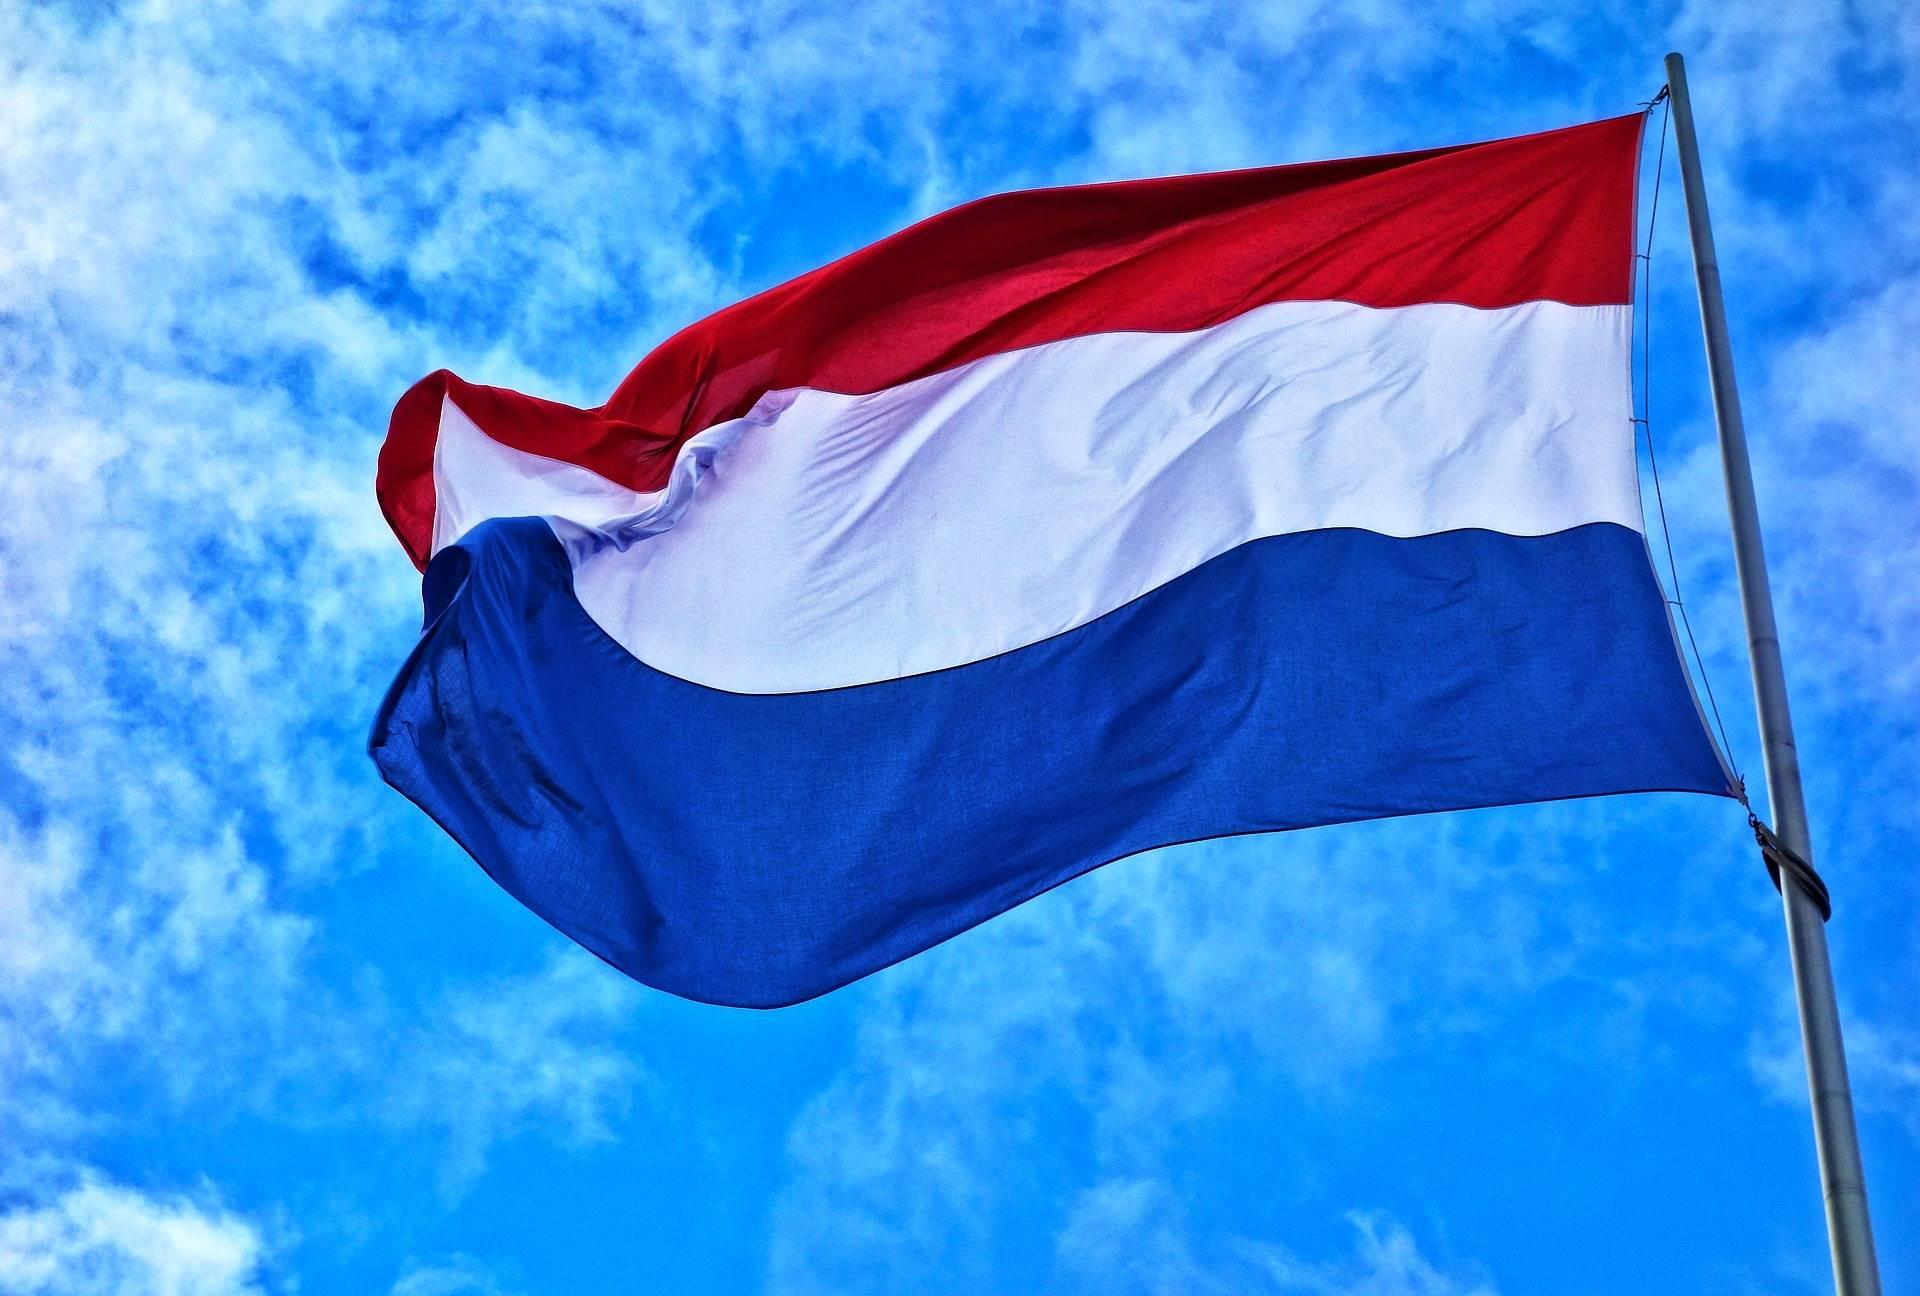 Nederlanders vlaggen op Koningsdag uit traditie en trots